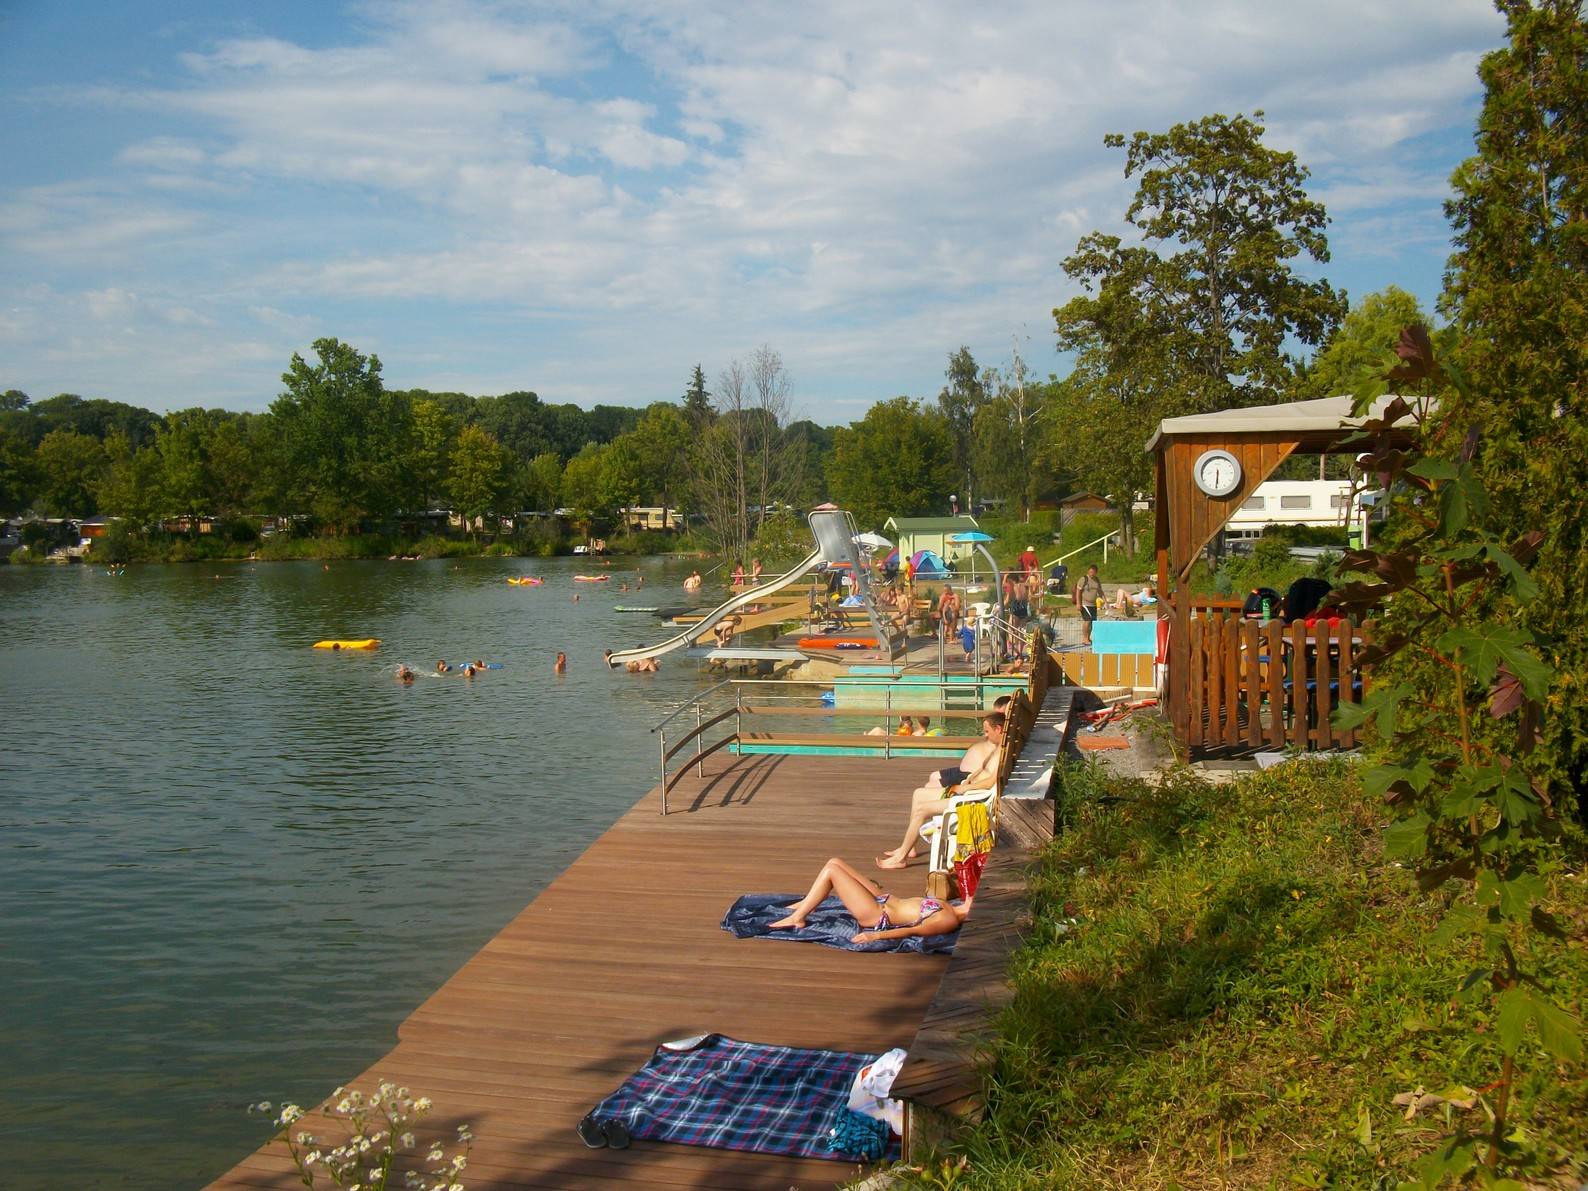 Campingplatz Sperrfechter Freizeitpark Camping Am See